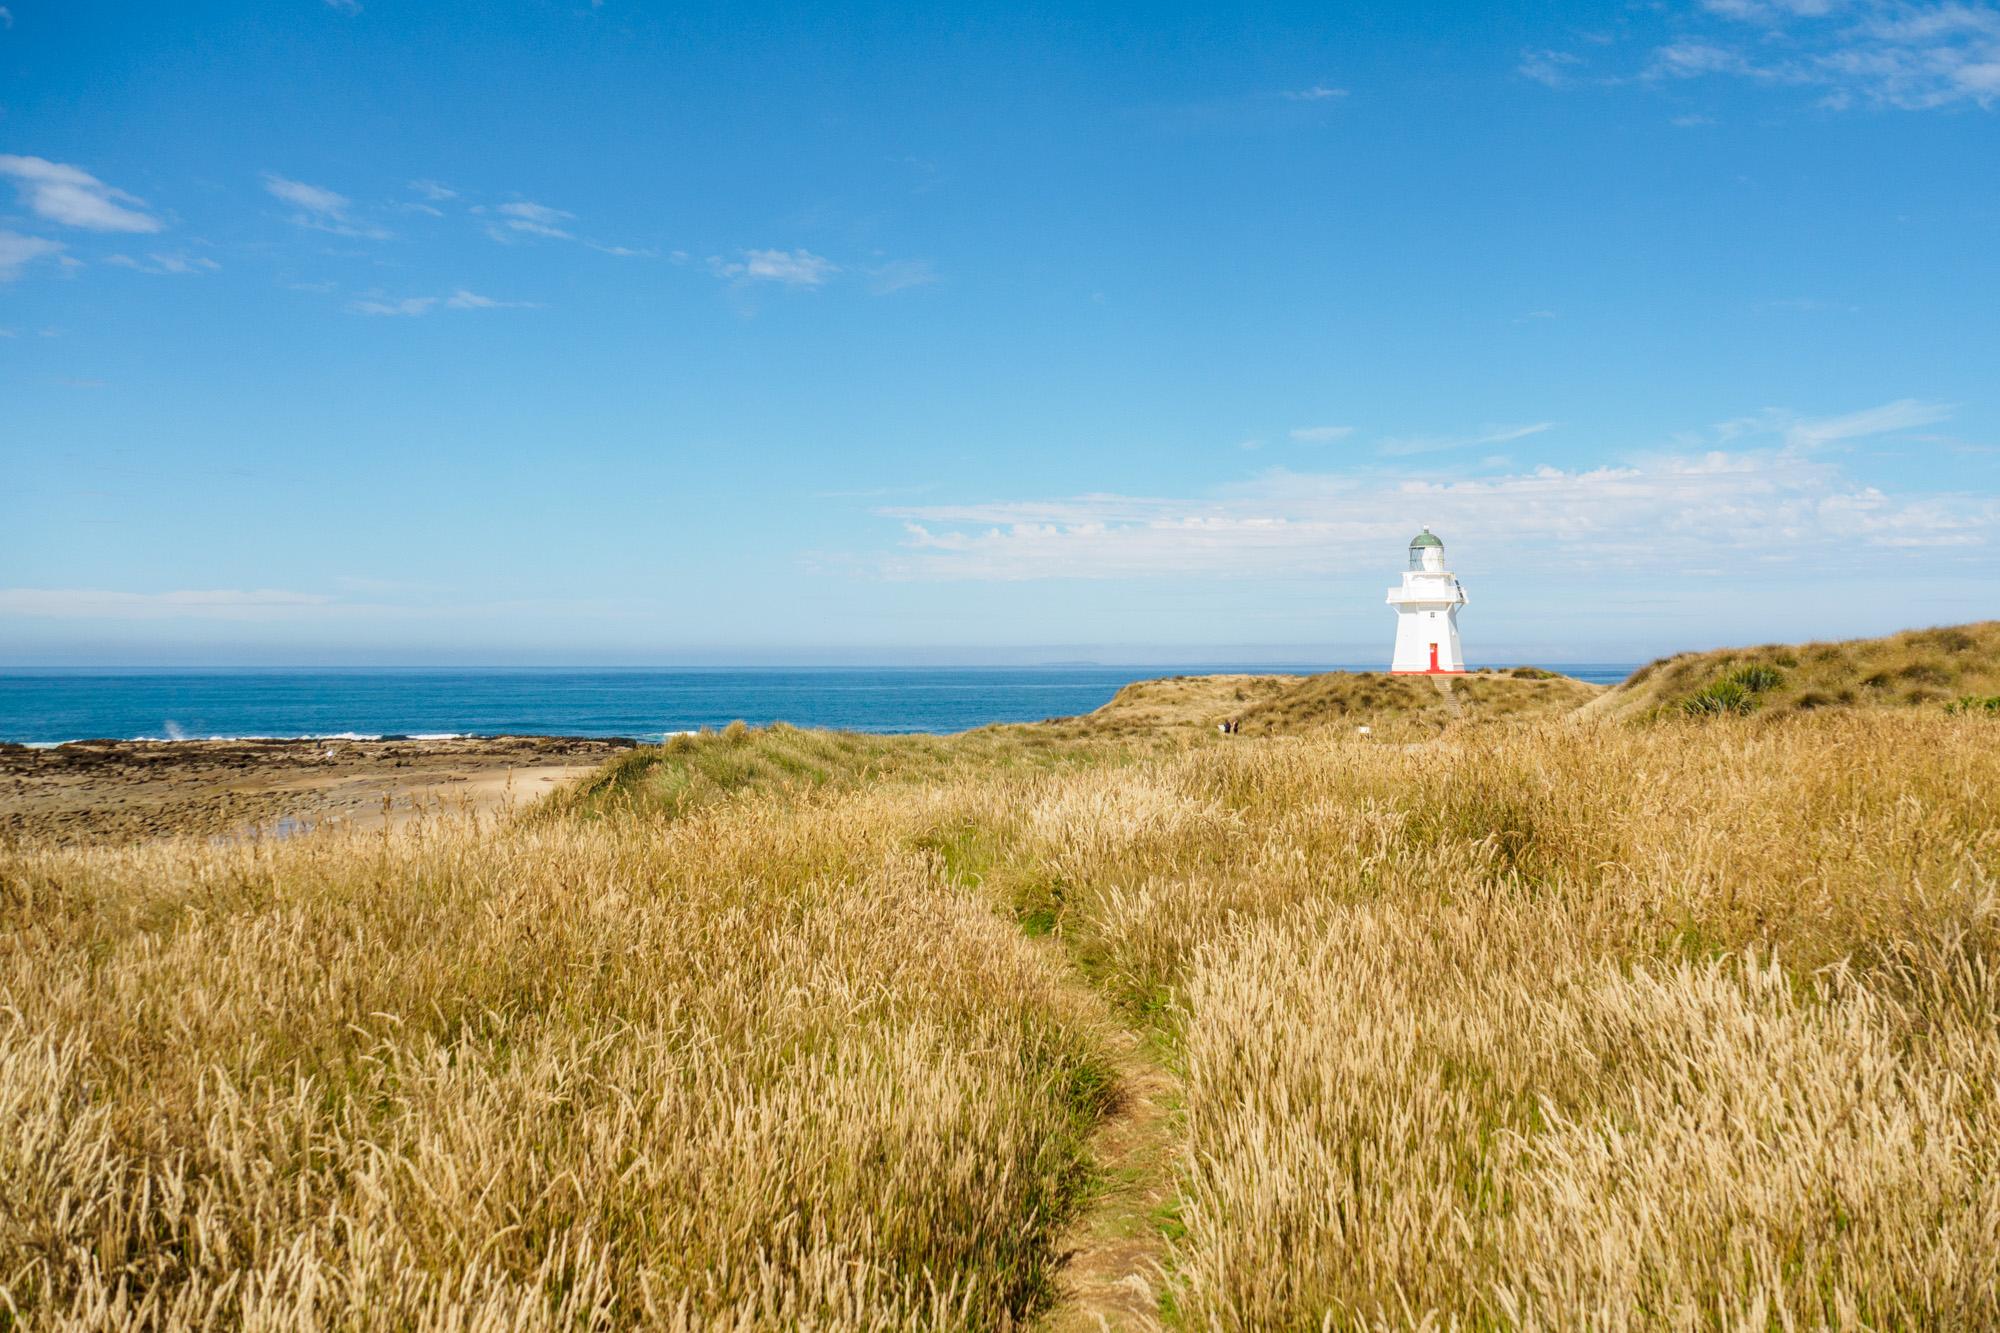 Catlins - Waipapa Point Lighthouse